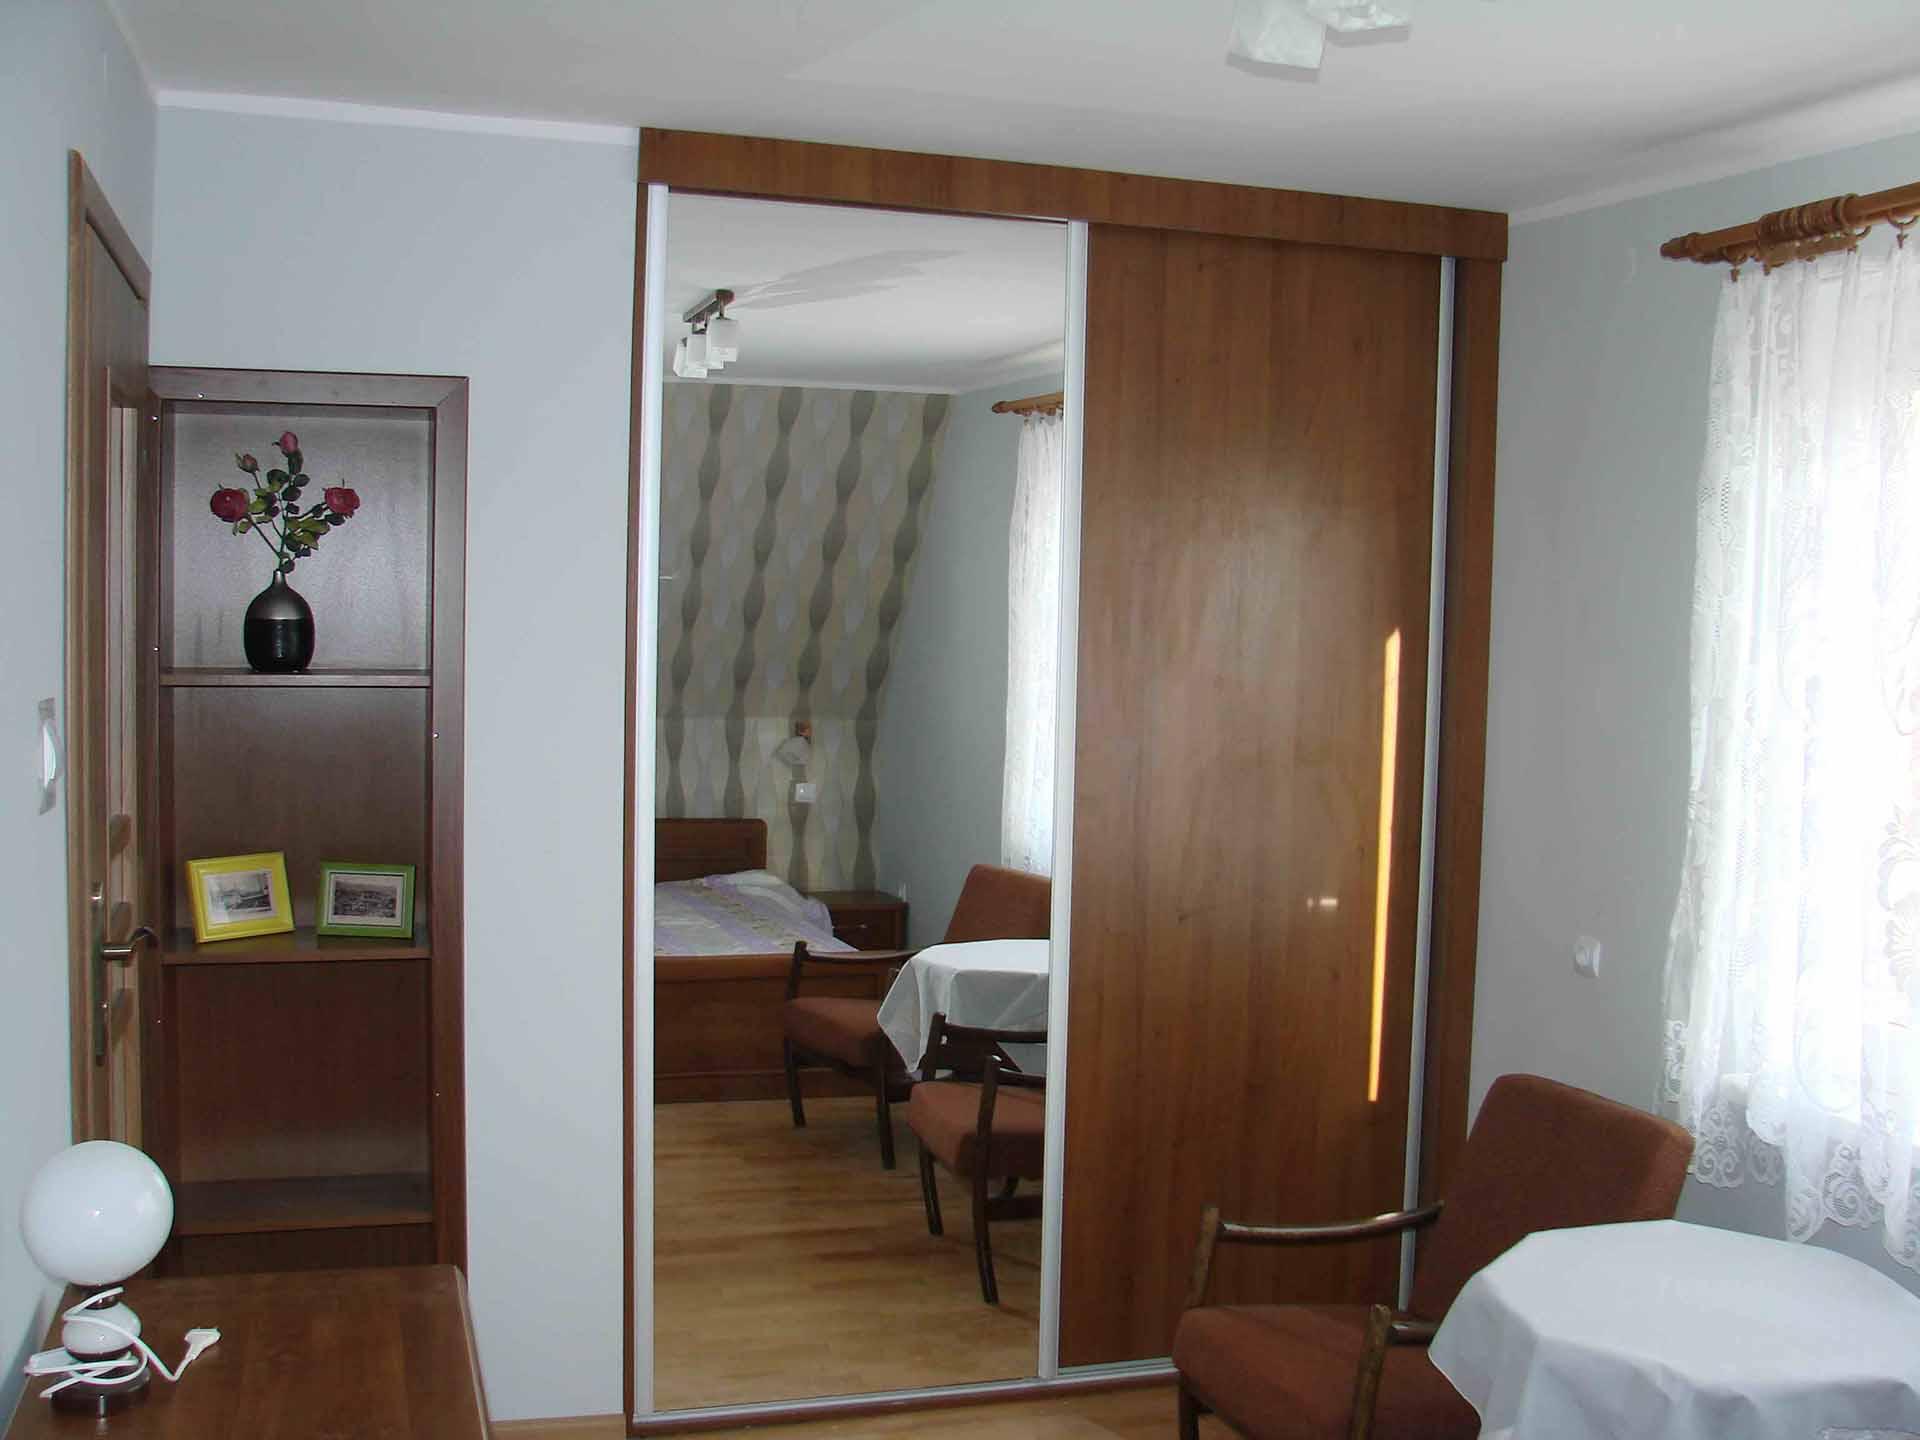 5 apartament sypialnia